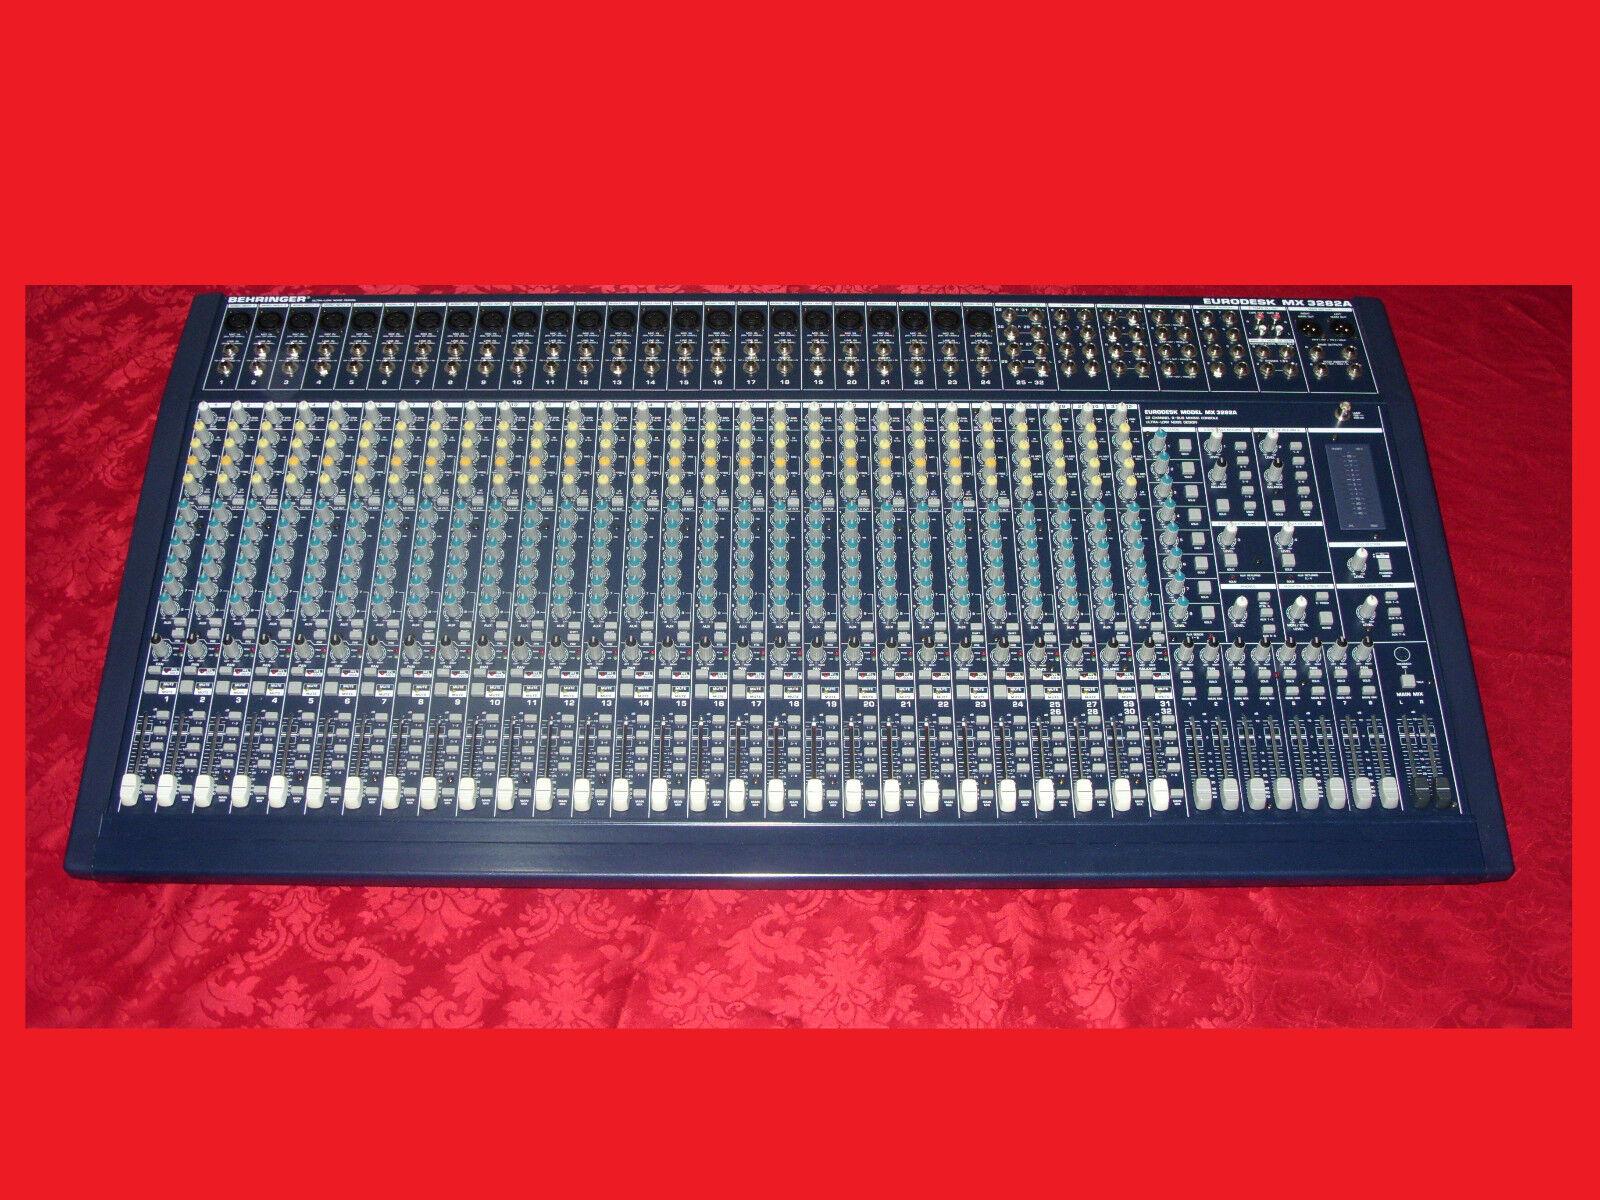 Behringer Eurodesk MX 3282 A Neuwertig